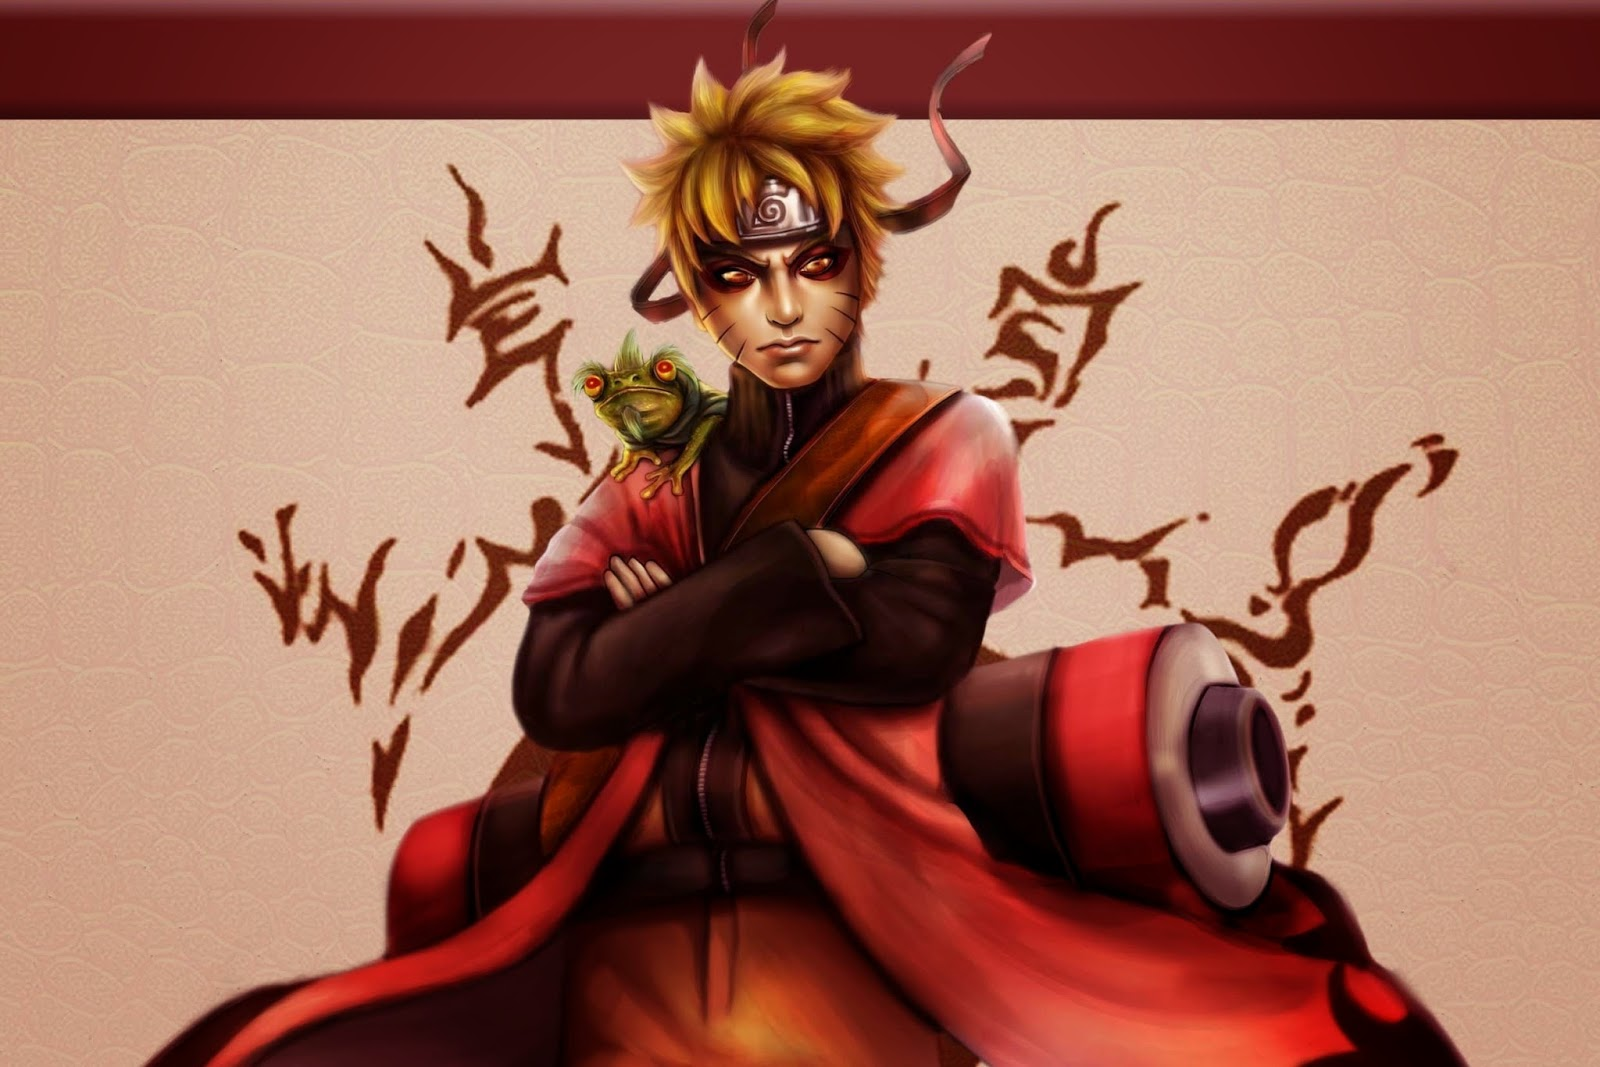 Top Wallpaper Naruto Red - Wallpaper%2BNaruto%2BShippuden%2B2  Pic_366112.jpg